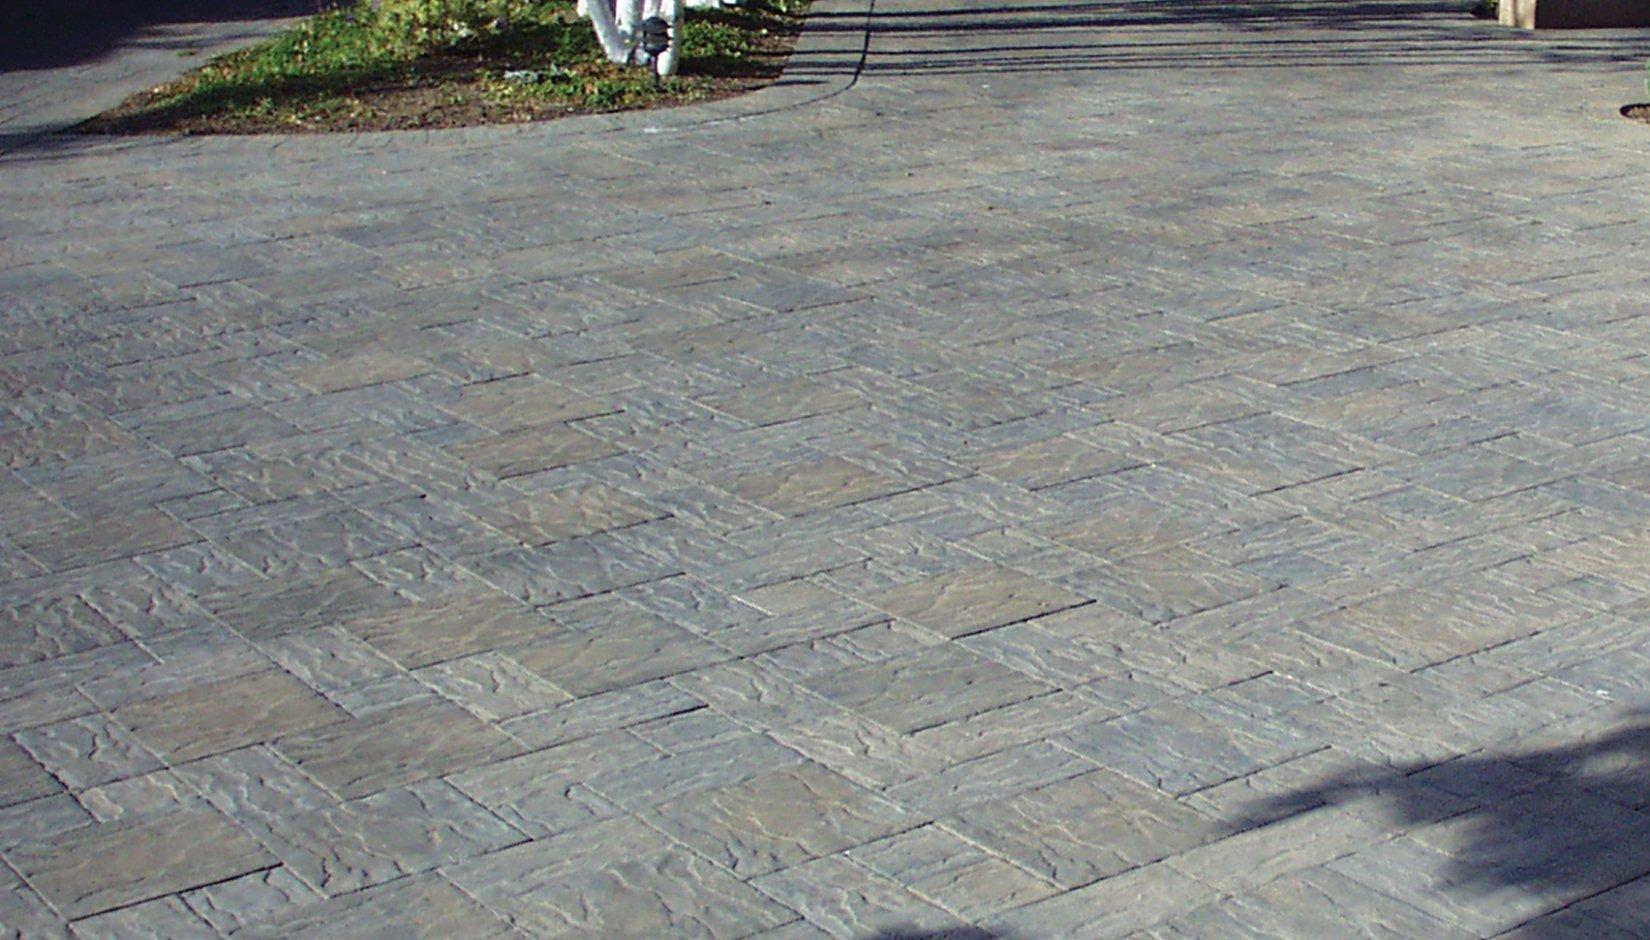 Pacific Interlock Paving Stone : Hydro flo™ textured estate pavers pacific interlock